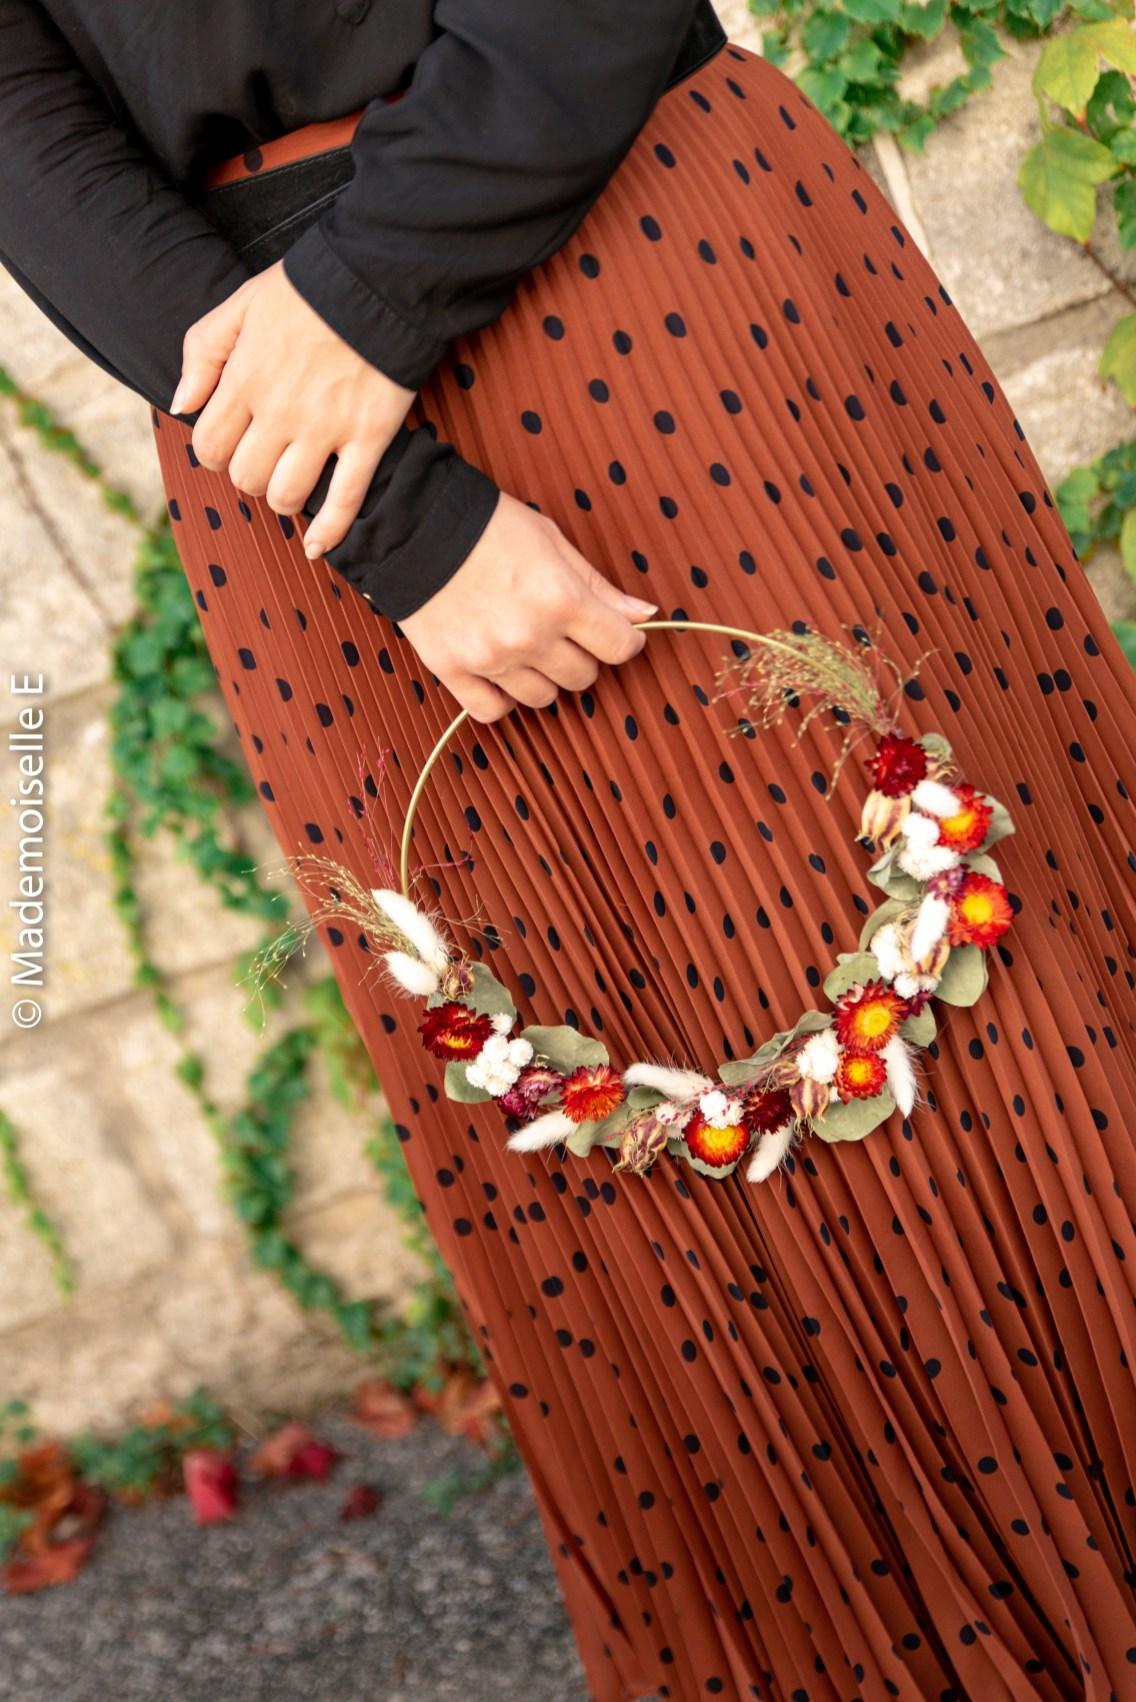 jupe_plissee_a_pois_couronne_fleurs_sechees_automne_2_mademoiselle-e